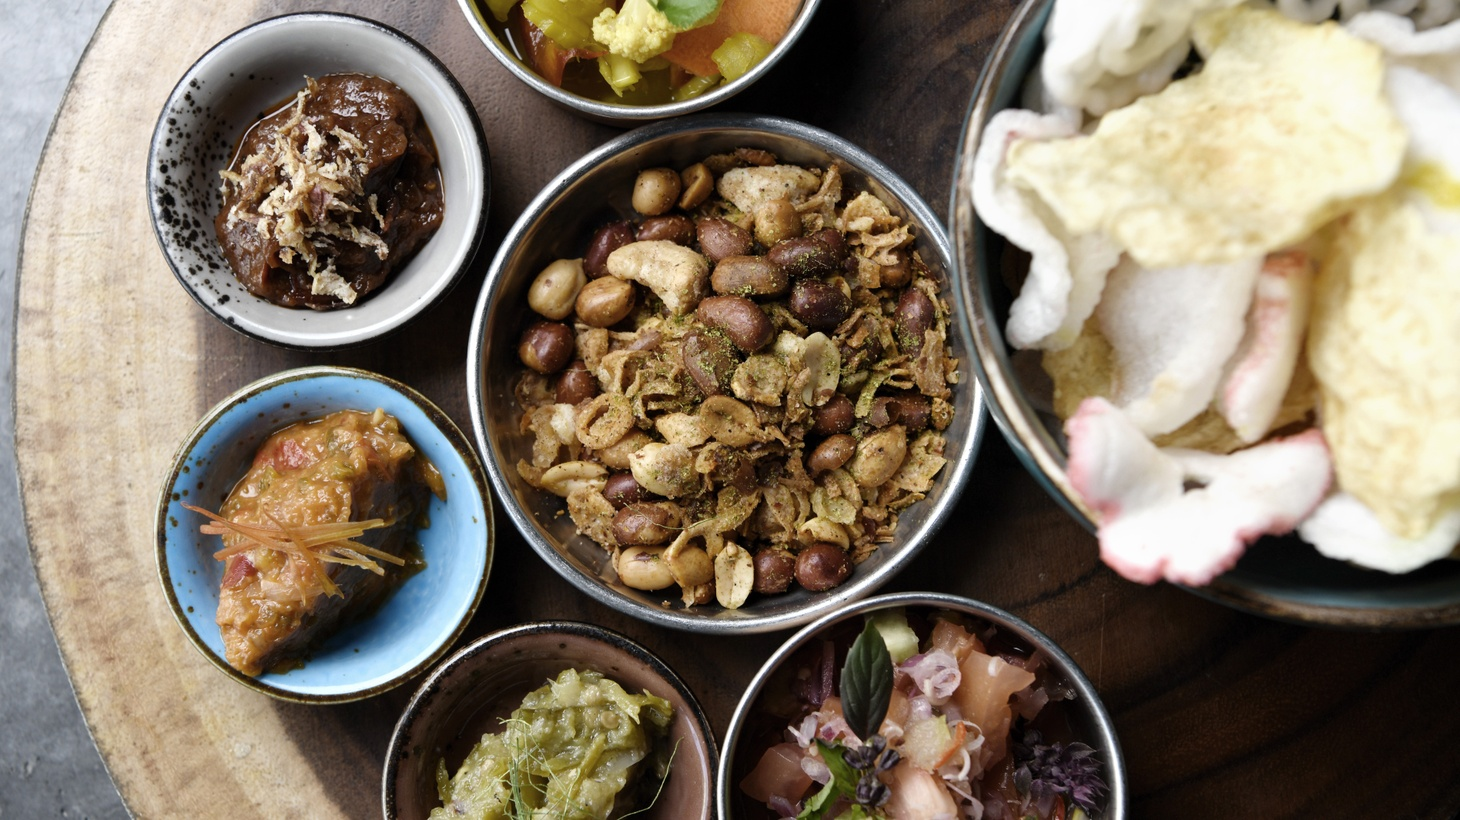 The sambal sample platter from Kasih, a new Indonesian restaurant in Little Tokyo.